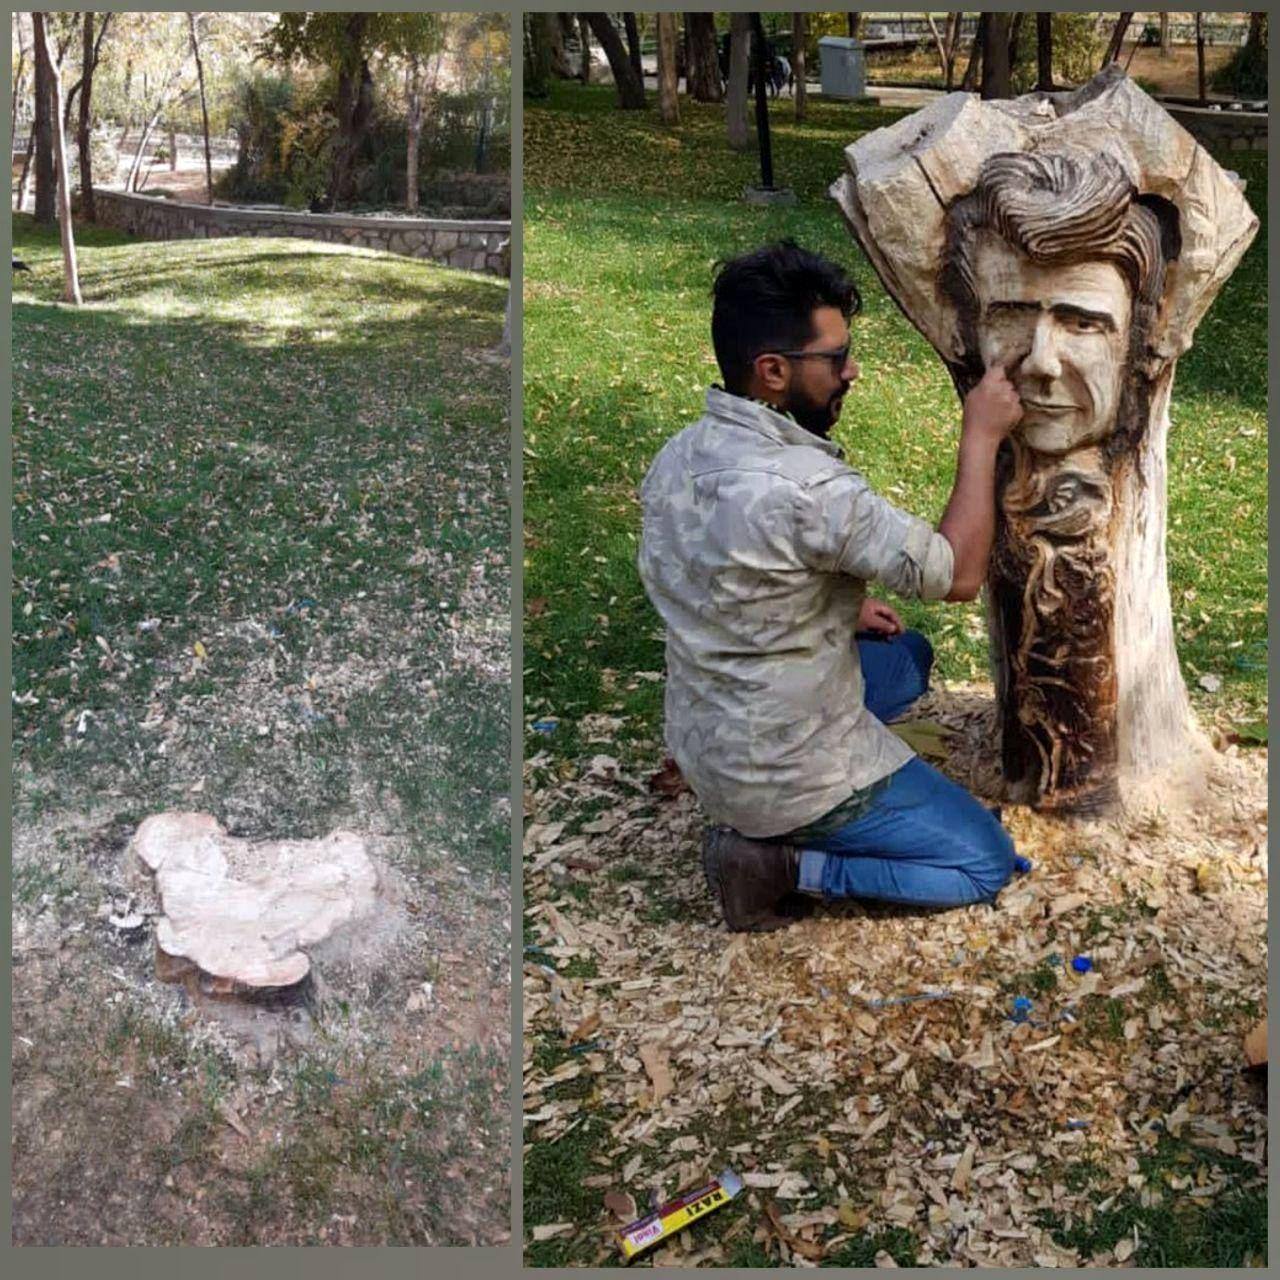 KJJ8E3dMnmjF - قطع تندیس شجریان در پارک ملت مشهد!+ عکس